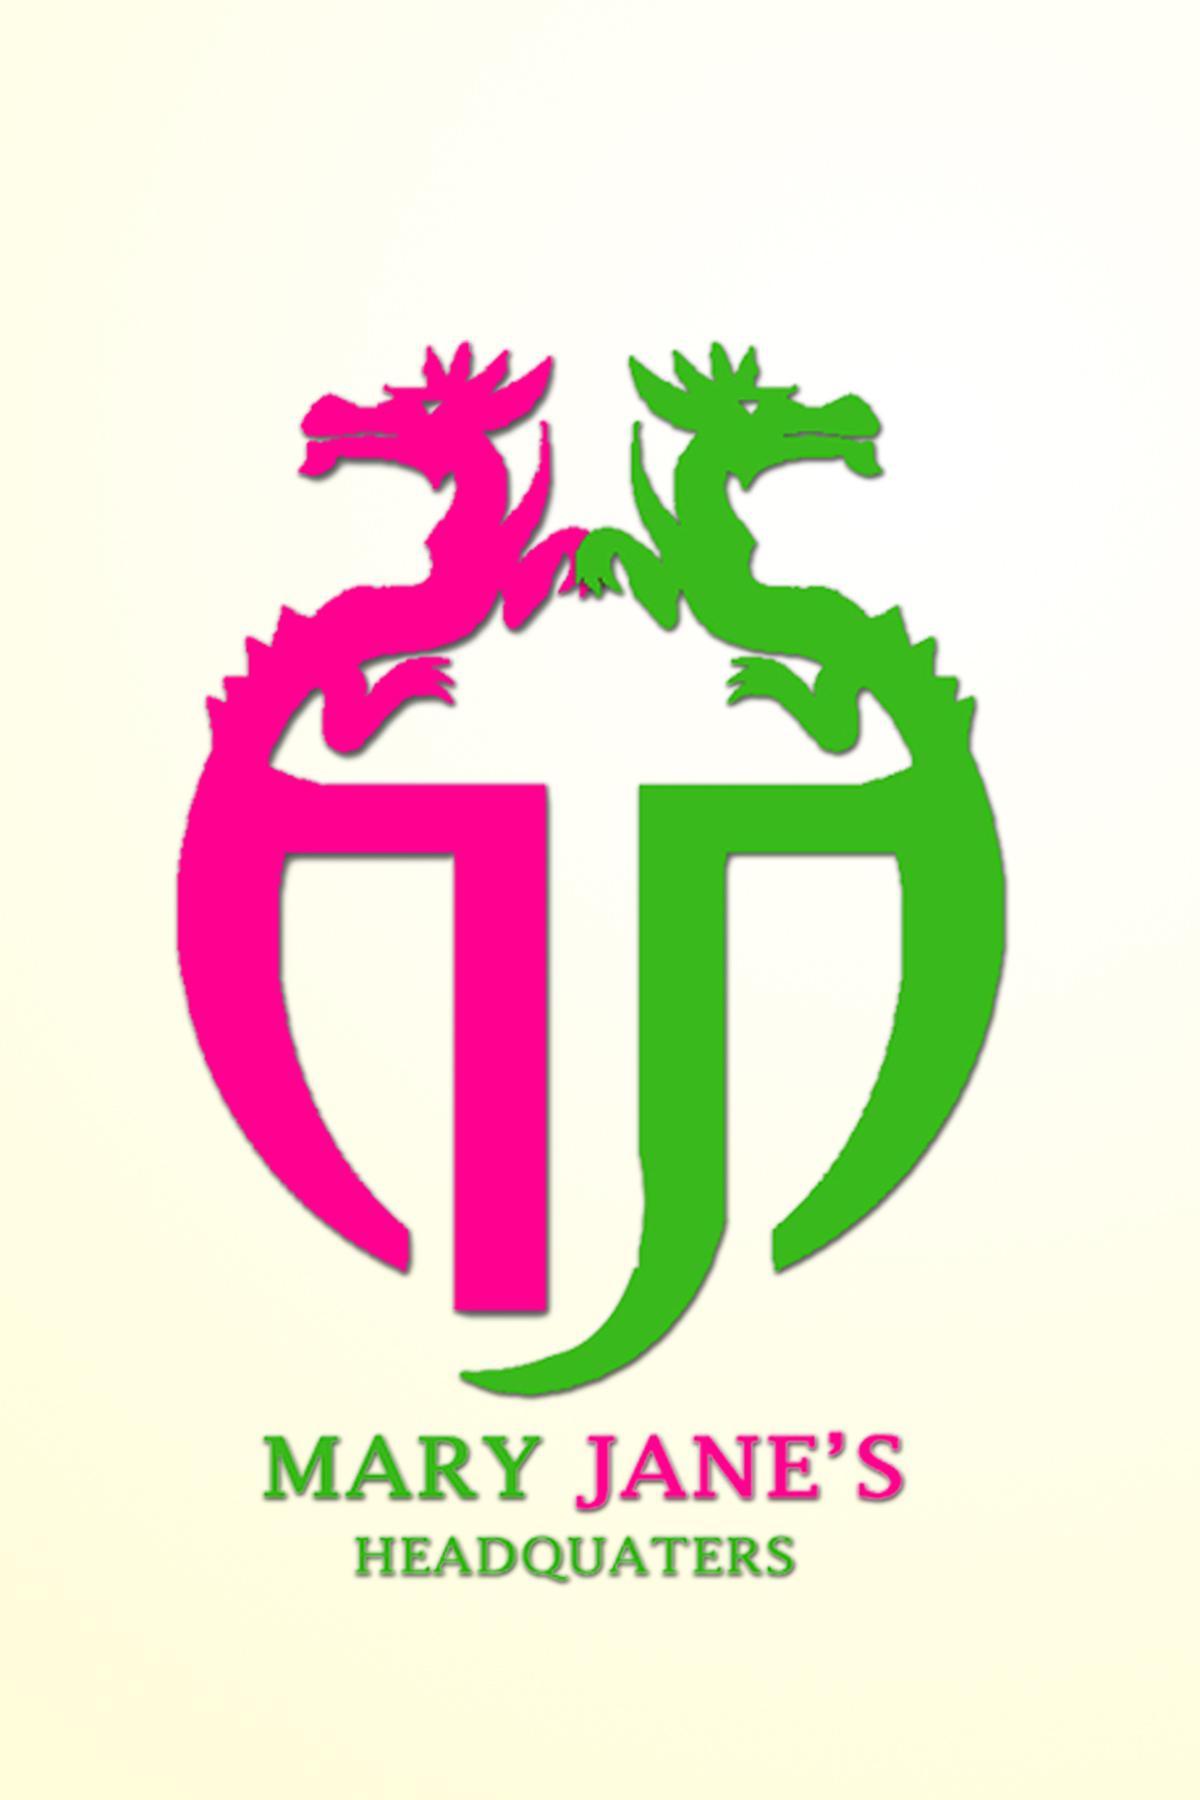 Logo Design by intentio_graphikos - Entry No. 76 in the Logo Design Contest Mary Jane's Headquarters Logo Design.